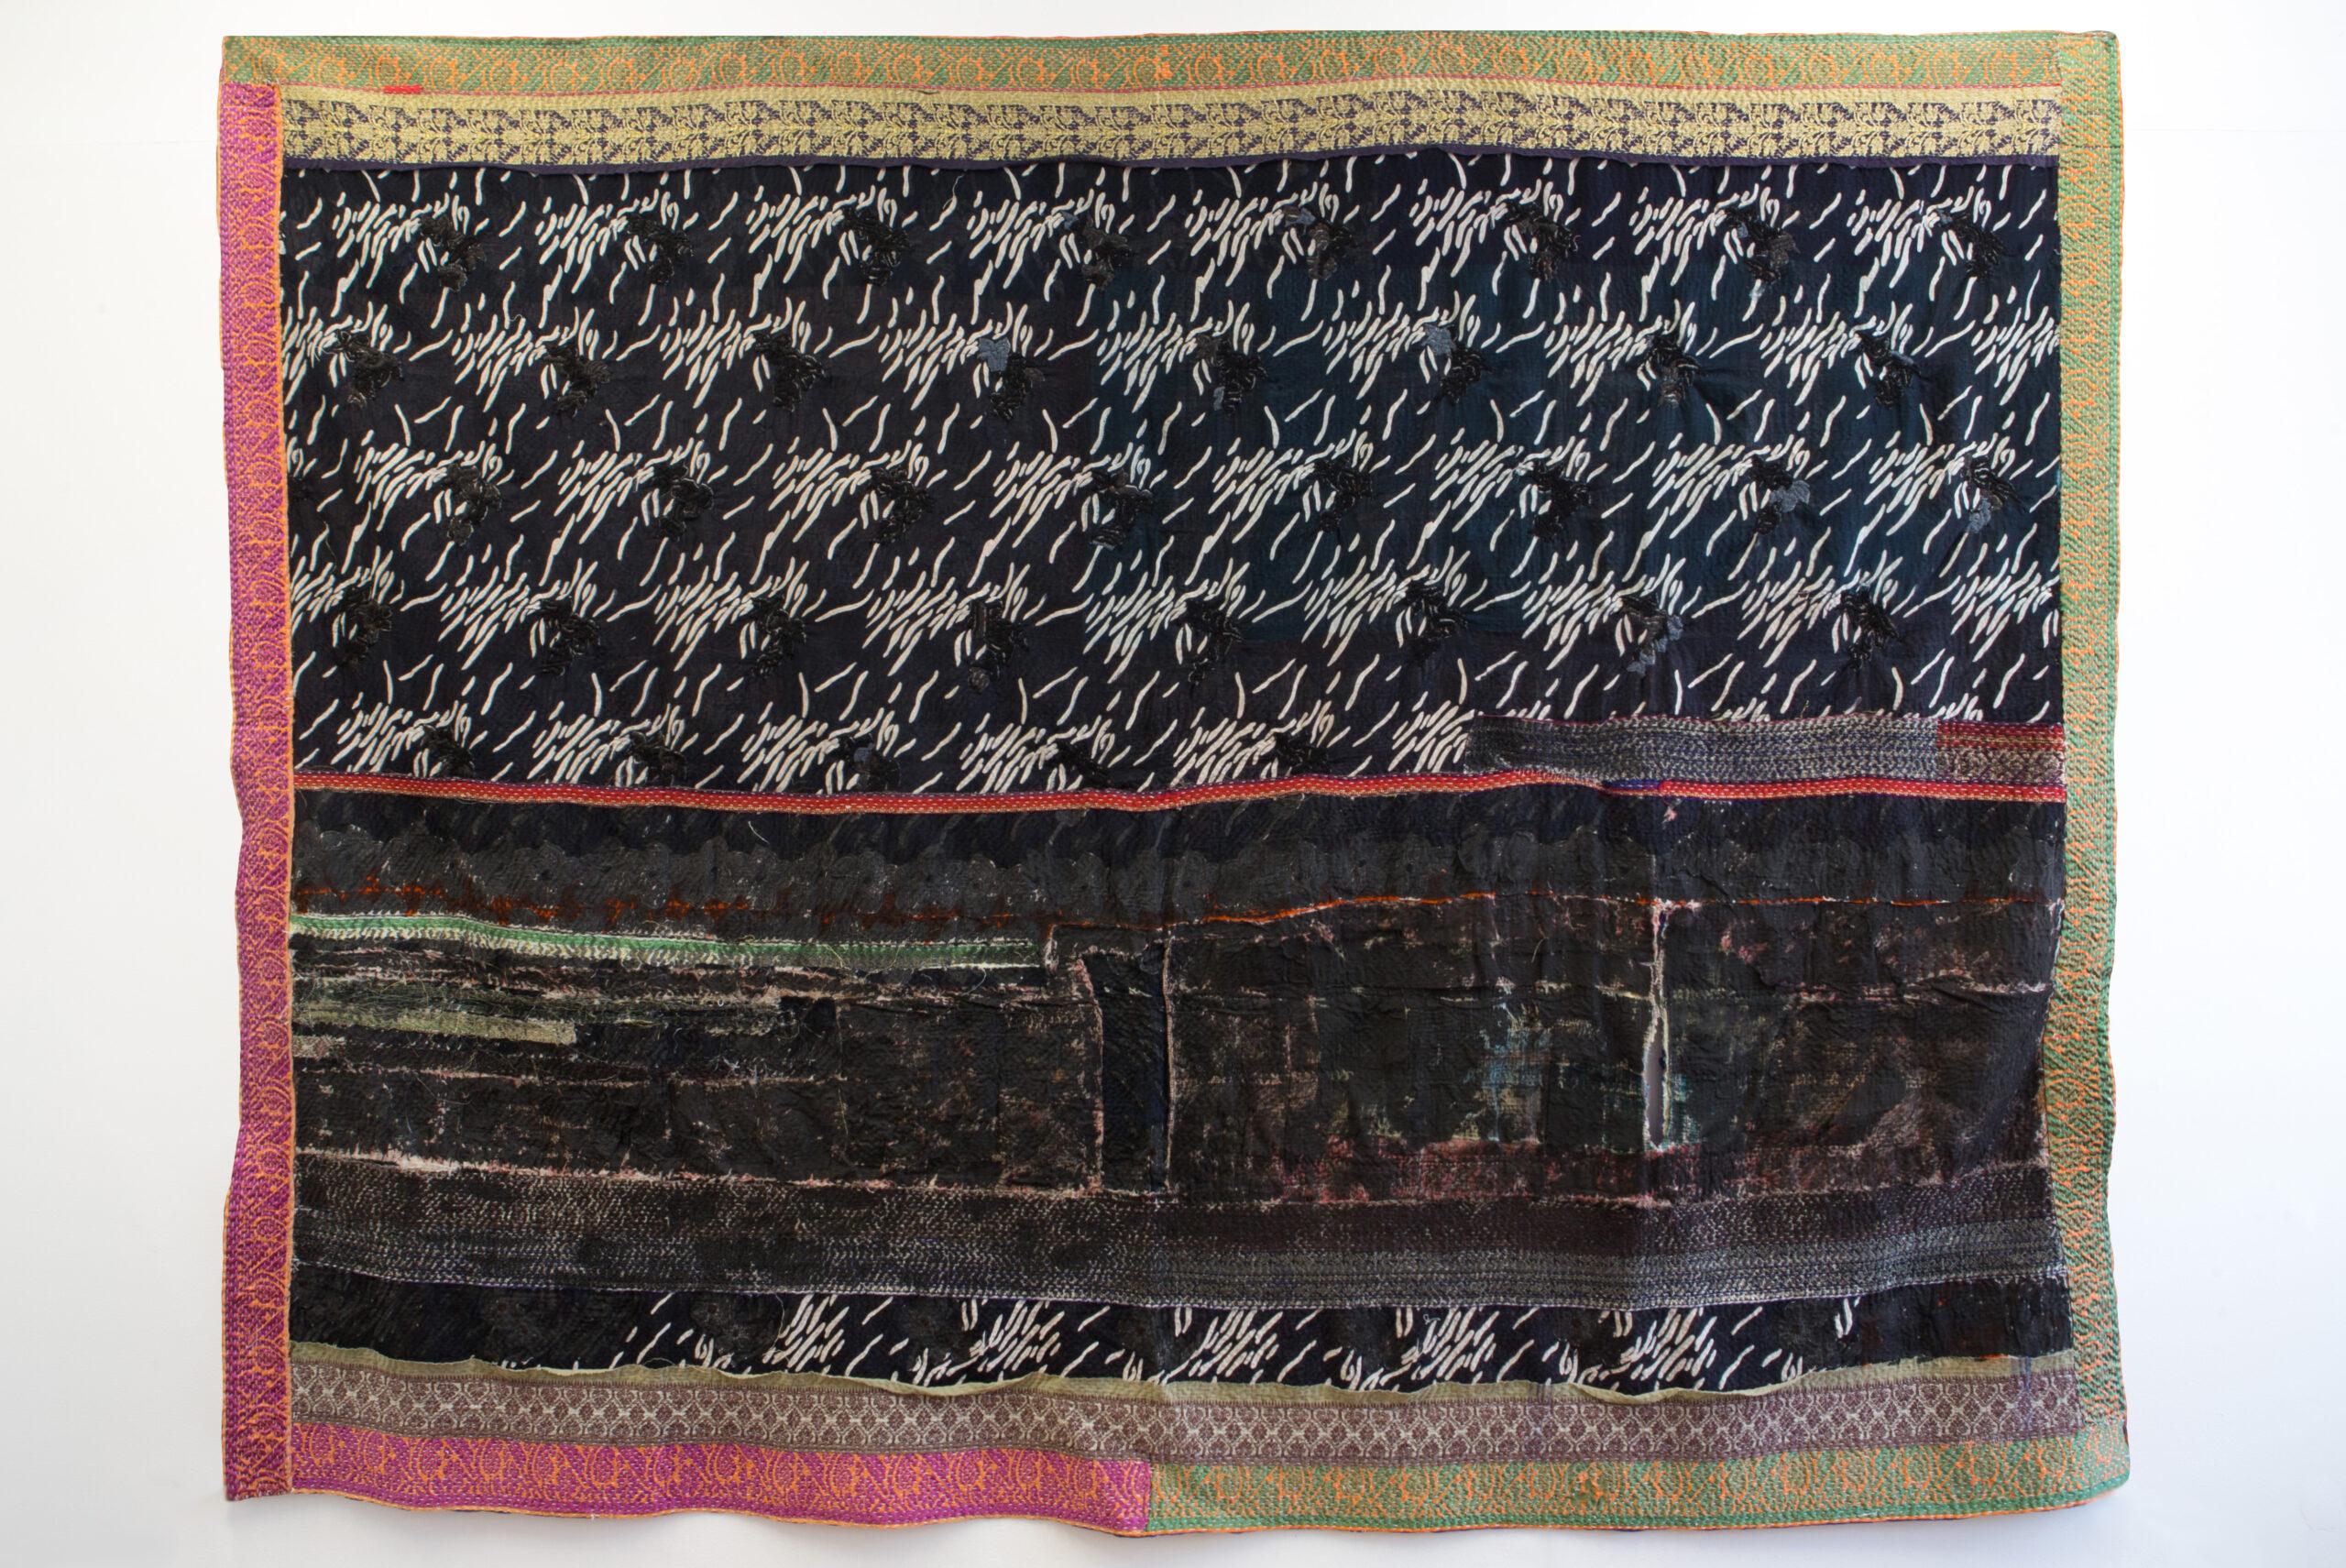 Maya Balcioglu Untitled (Bed Piece 4) (2021) Ink on found quilt, embroidery in wool and cotton thread, 150 cm x 200 cm